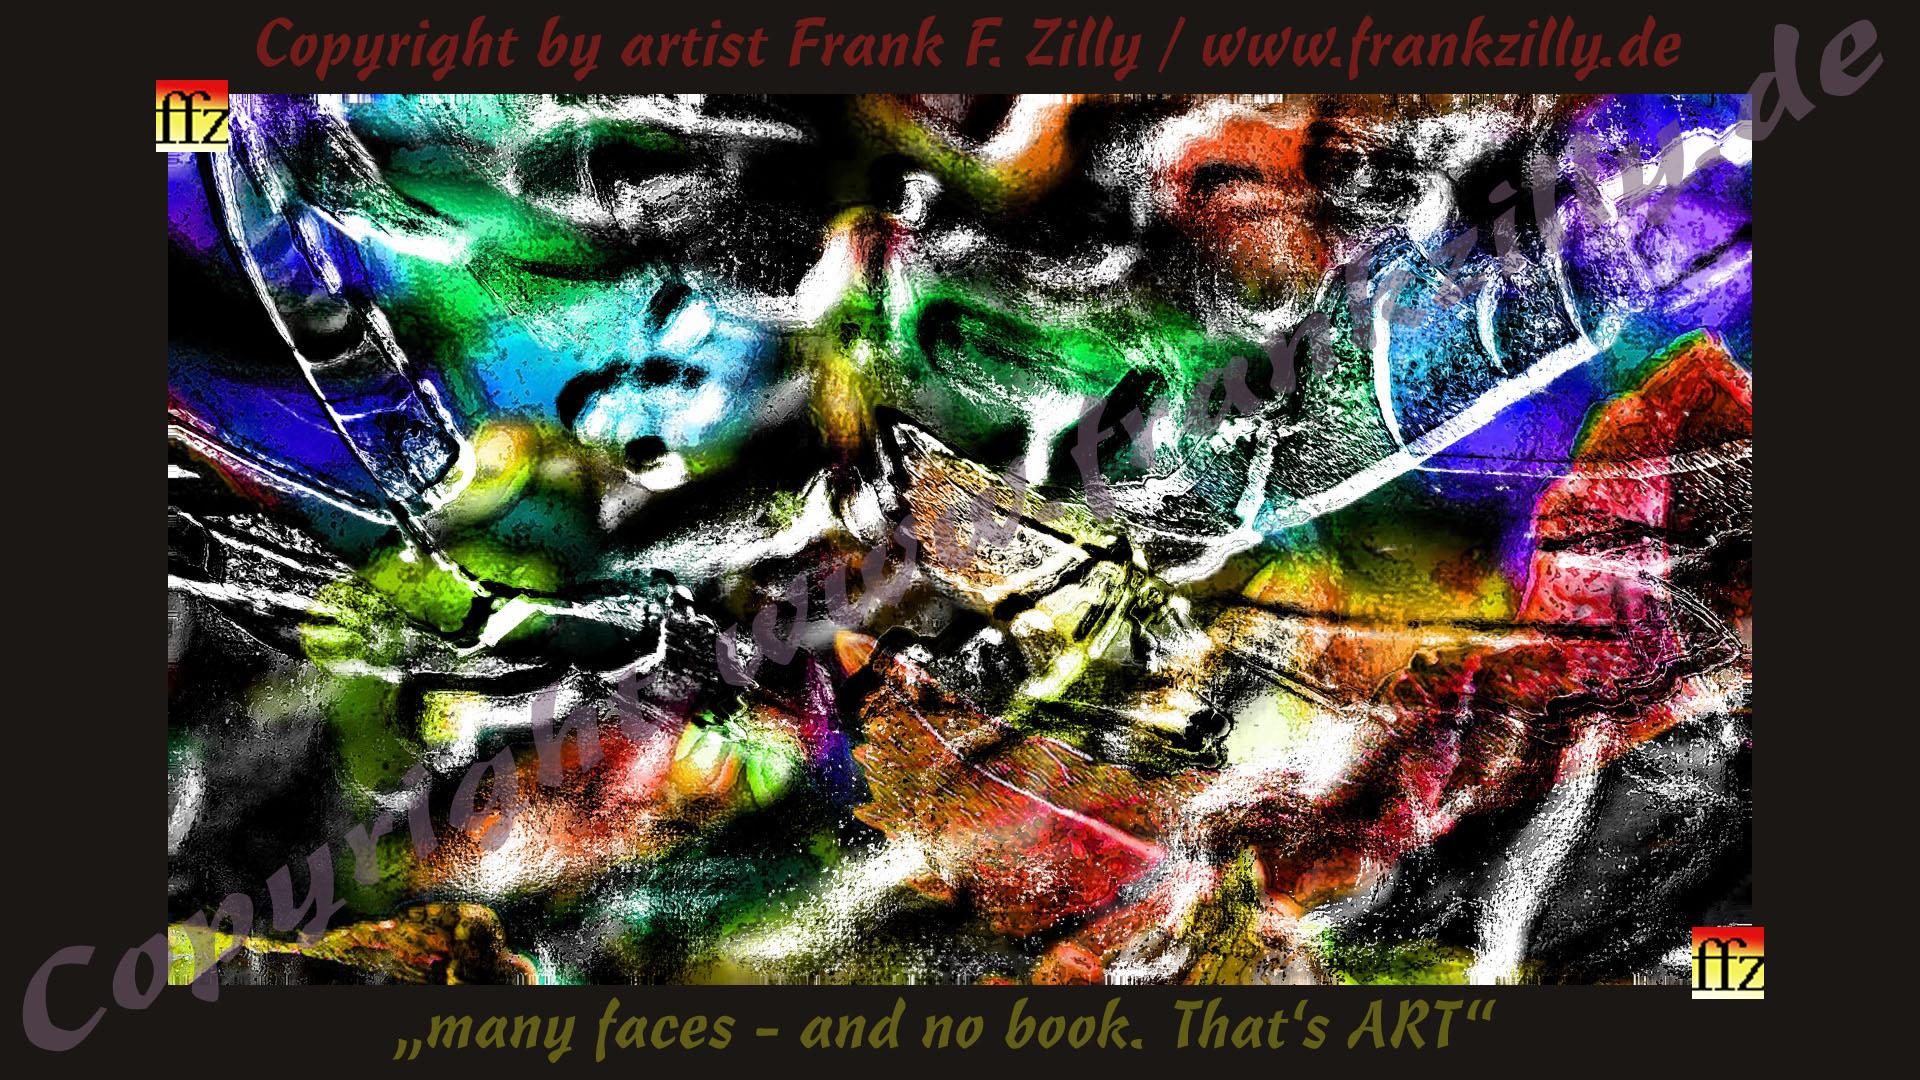 Zilly (ffz) | abstrakte Kunst digital